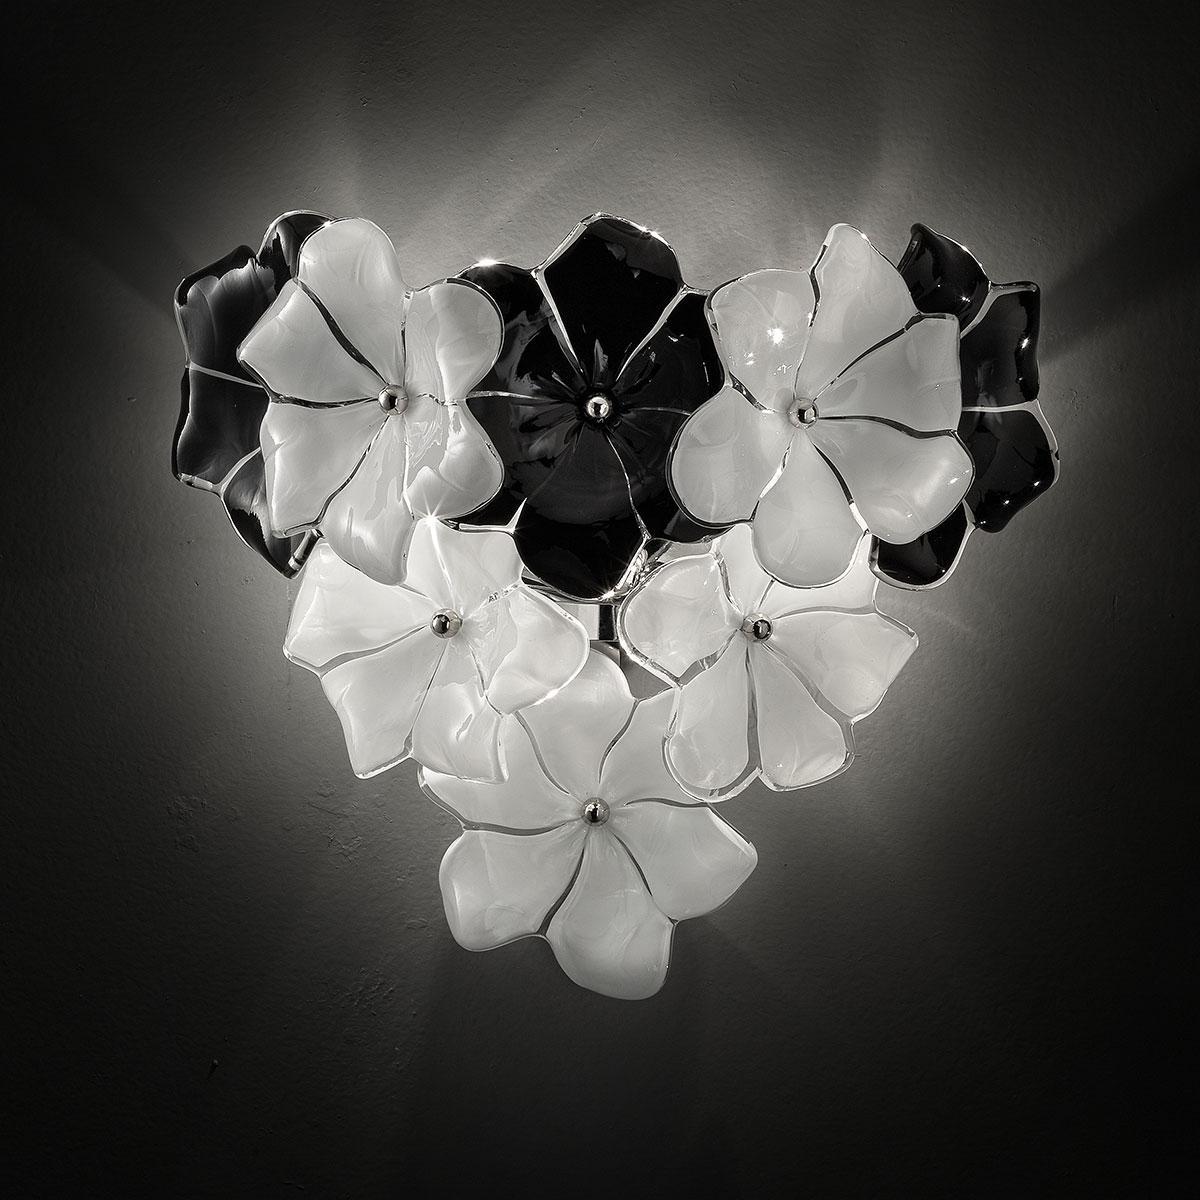 """Loto"" applique en verre de Murano - blanc et noir"